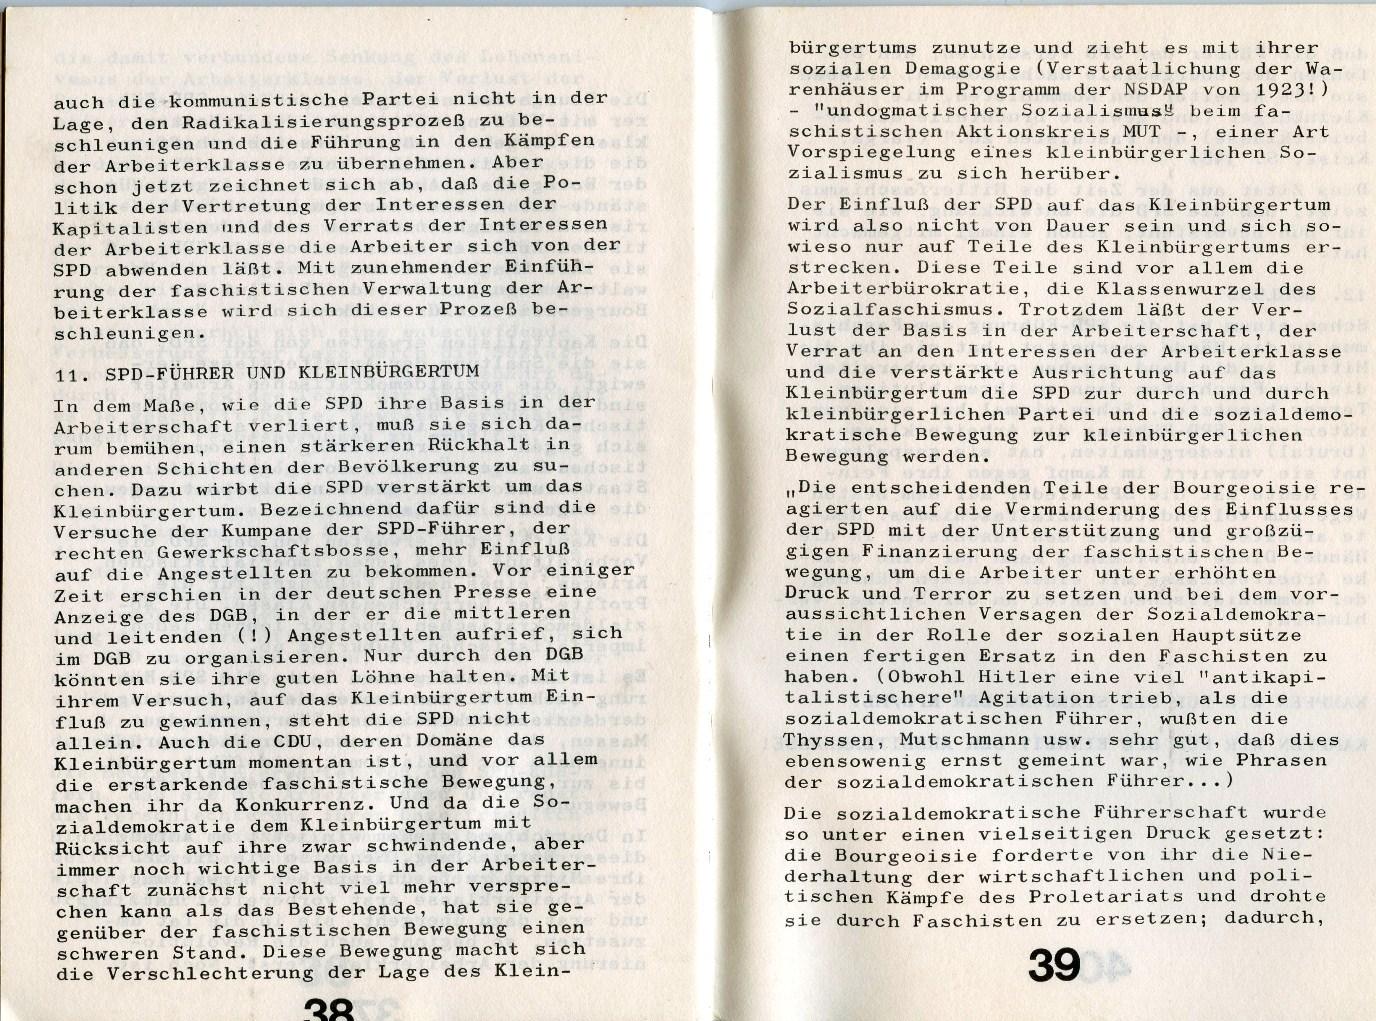 KJVD_Sozialdemokratie_Sozialfaschismus_1971_21